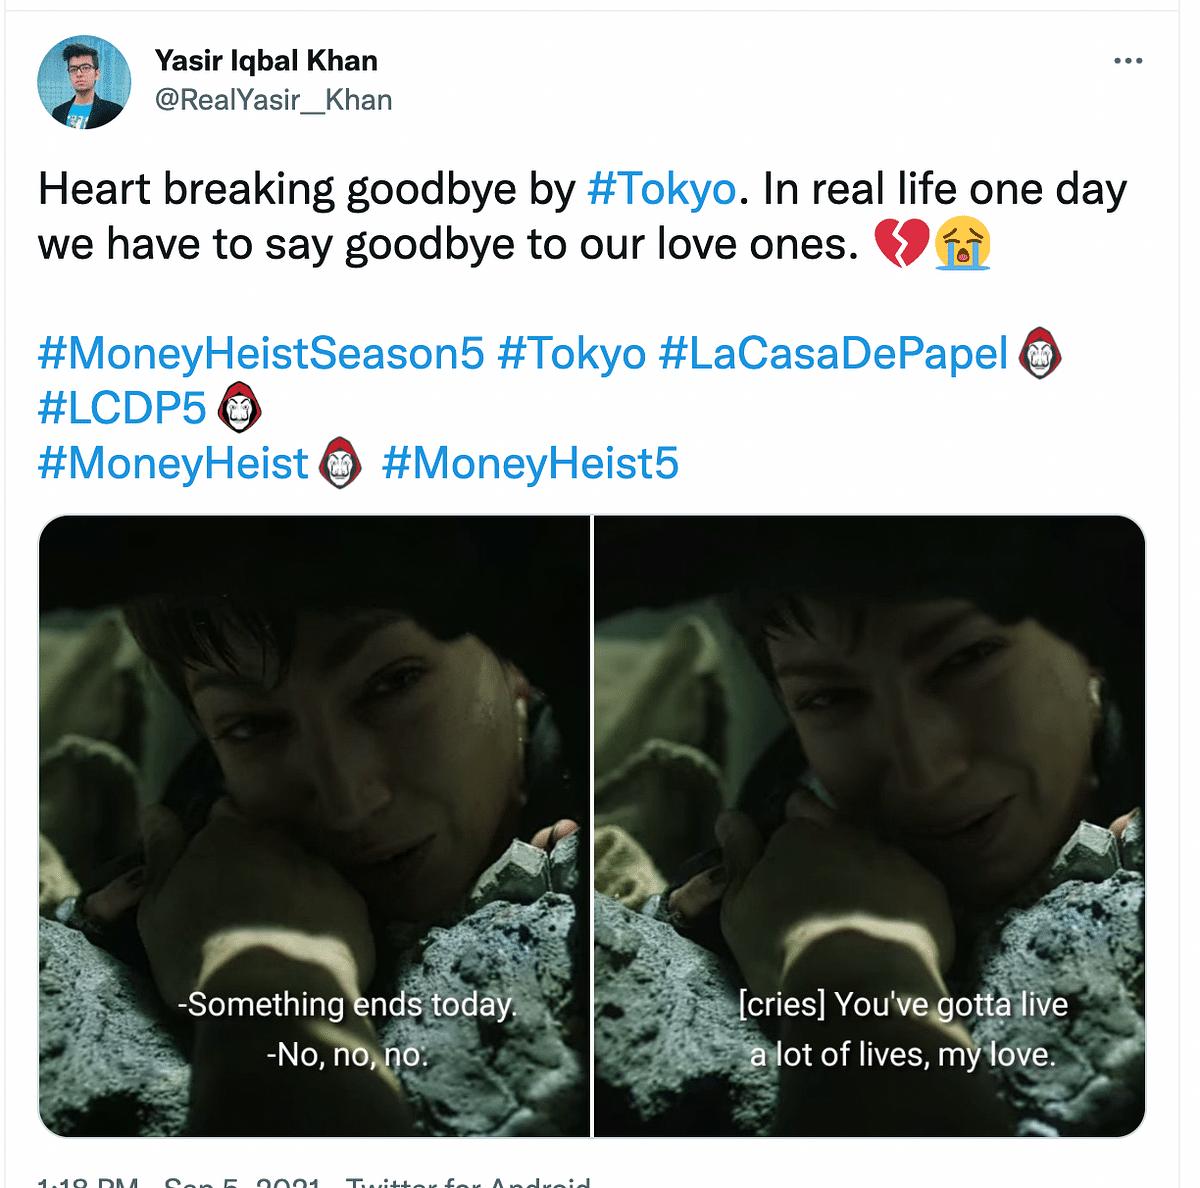 Money Heist Season 5 Vol 1: Fans Bid Emotional Adieu to Tokyo